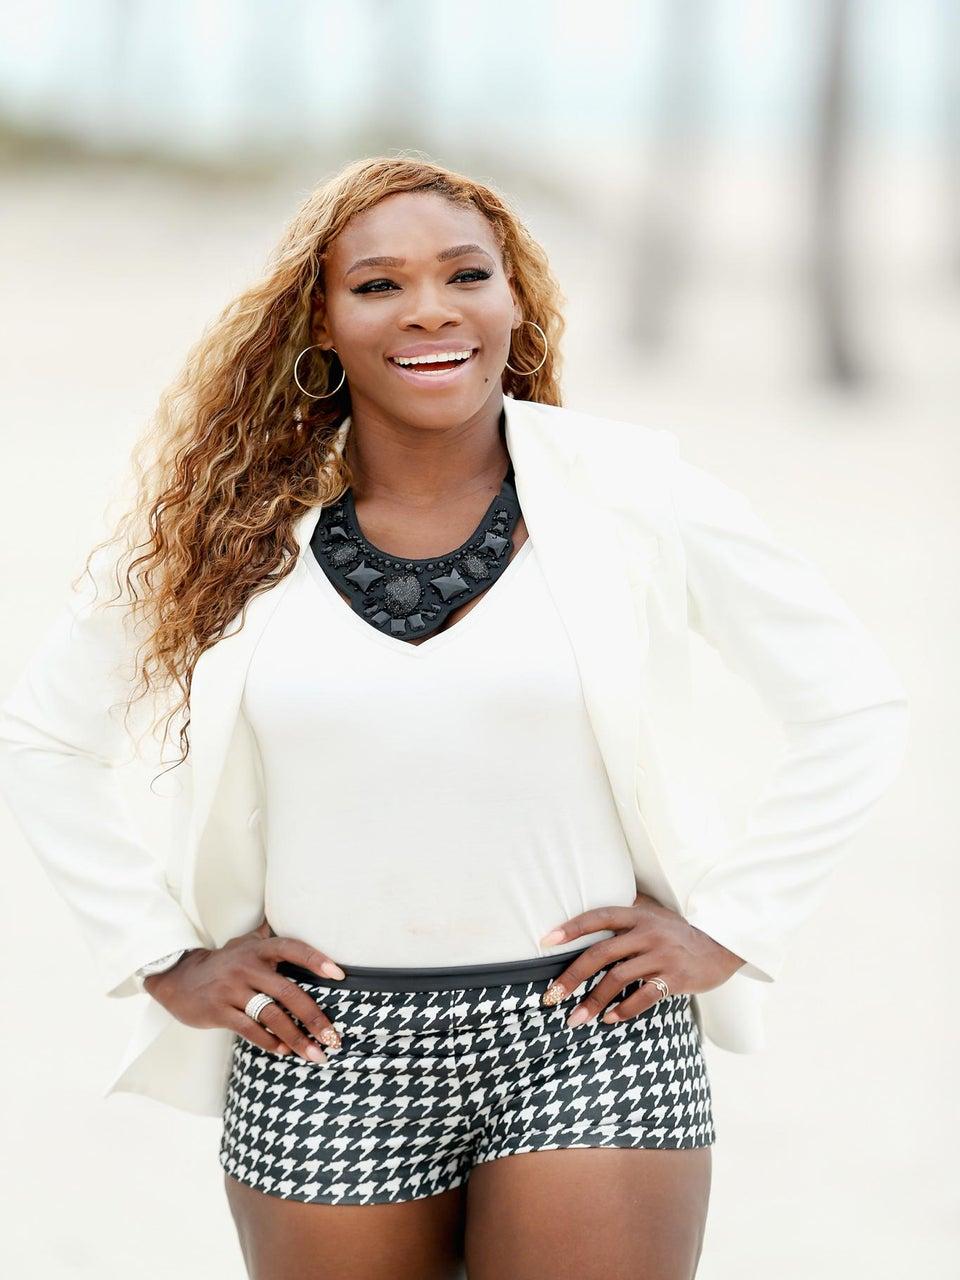 Serena Williams, Ava DuVernay to Be Featured in Annie Leibovitz Calendar